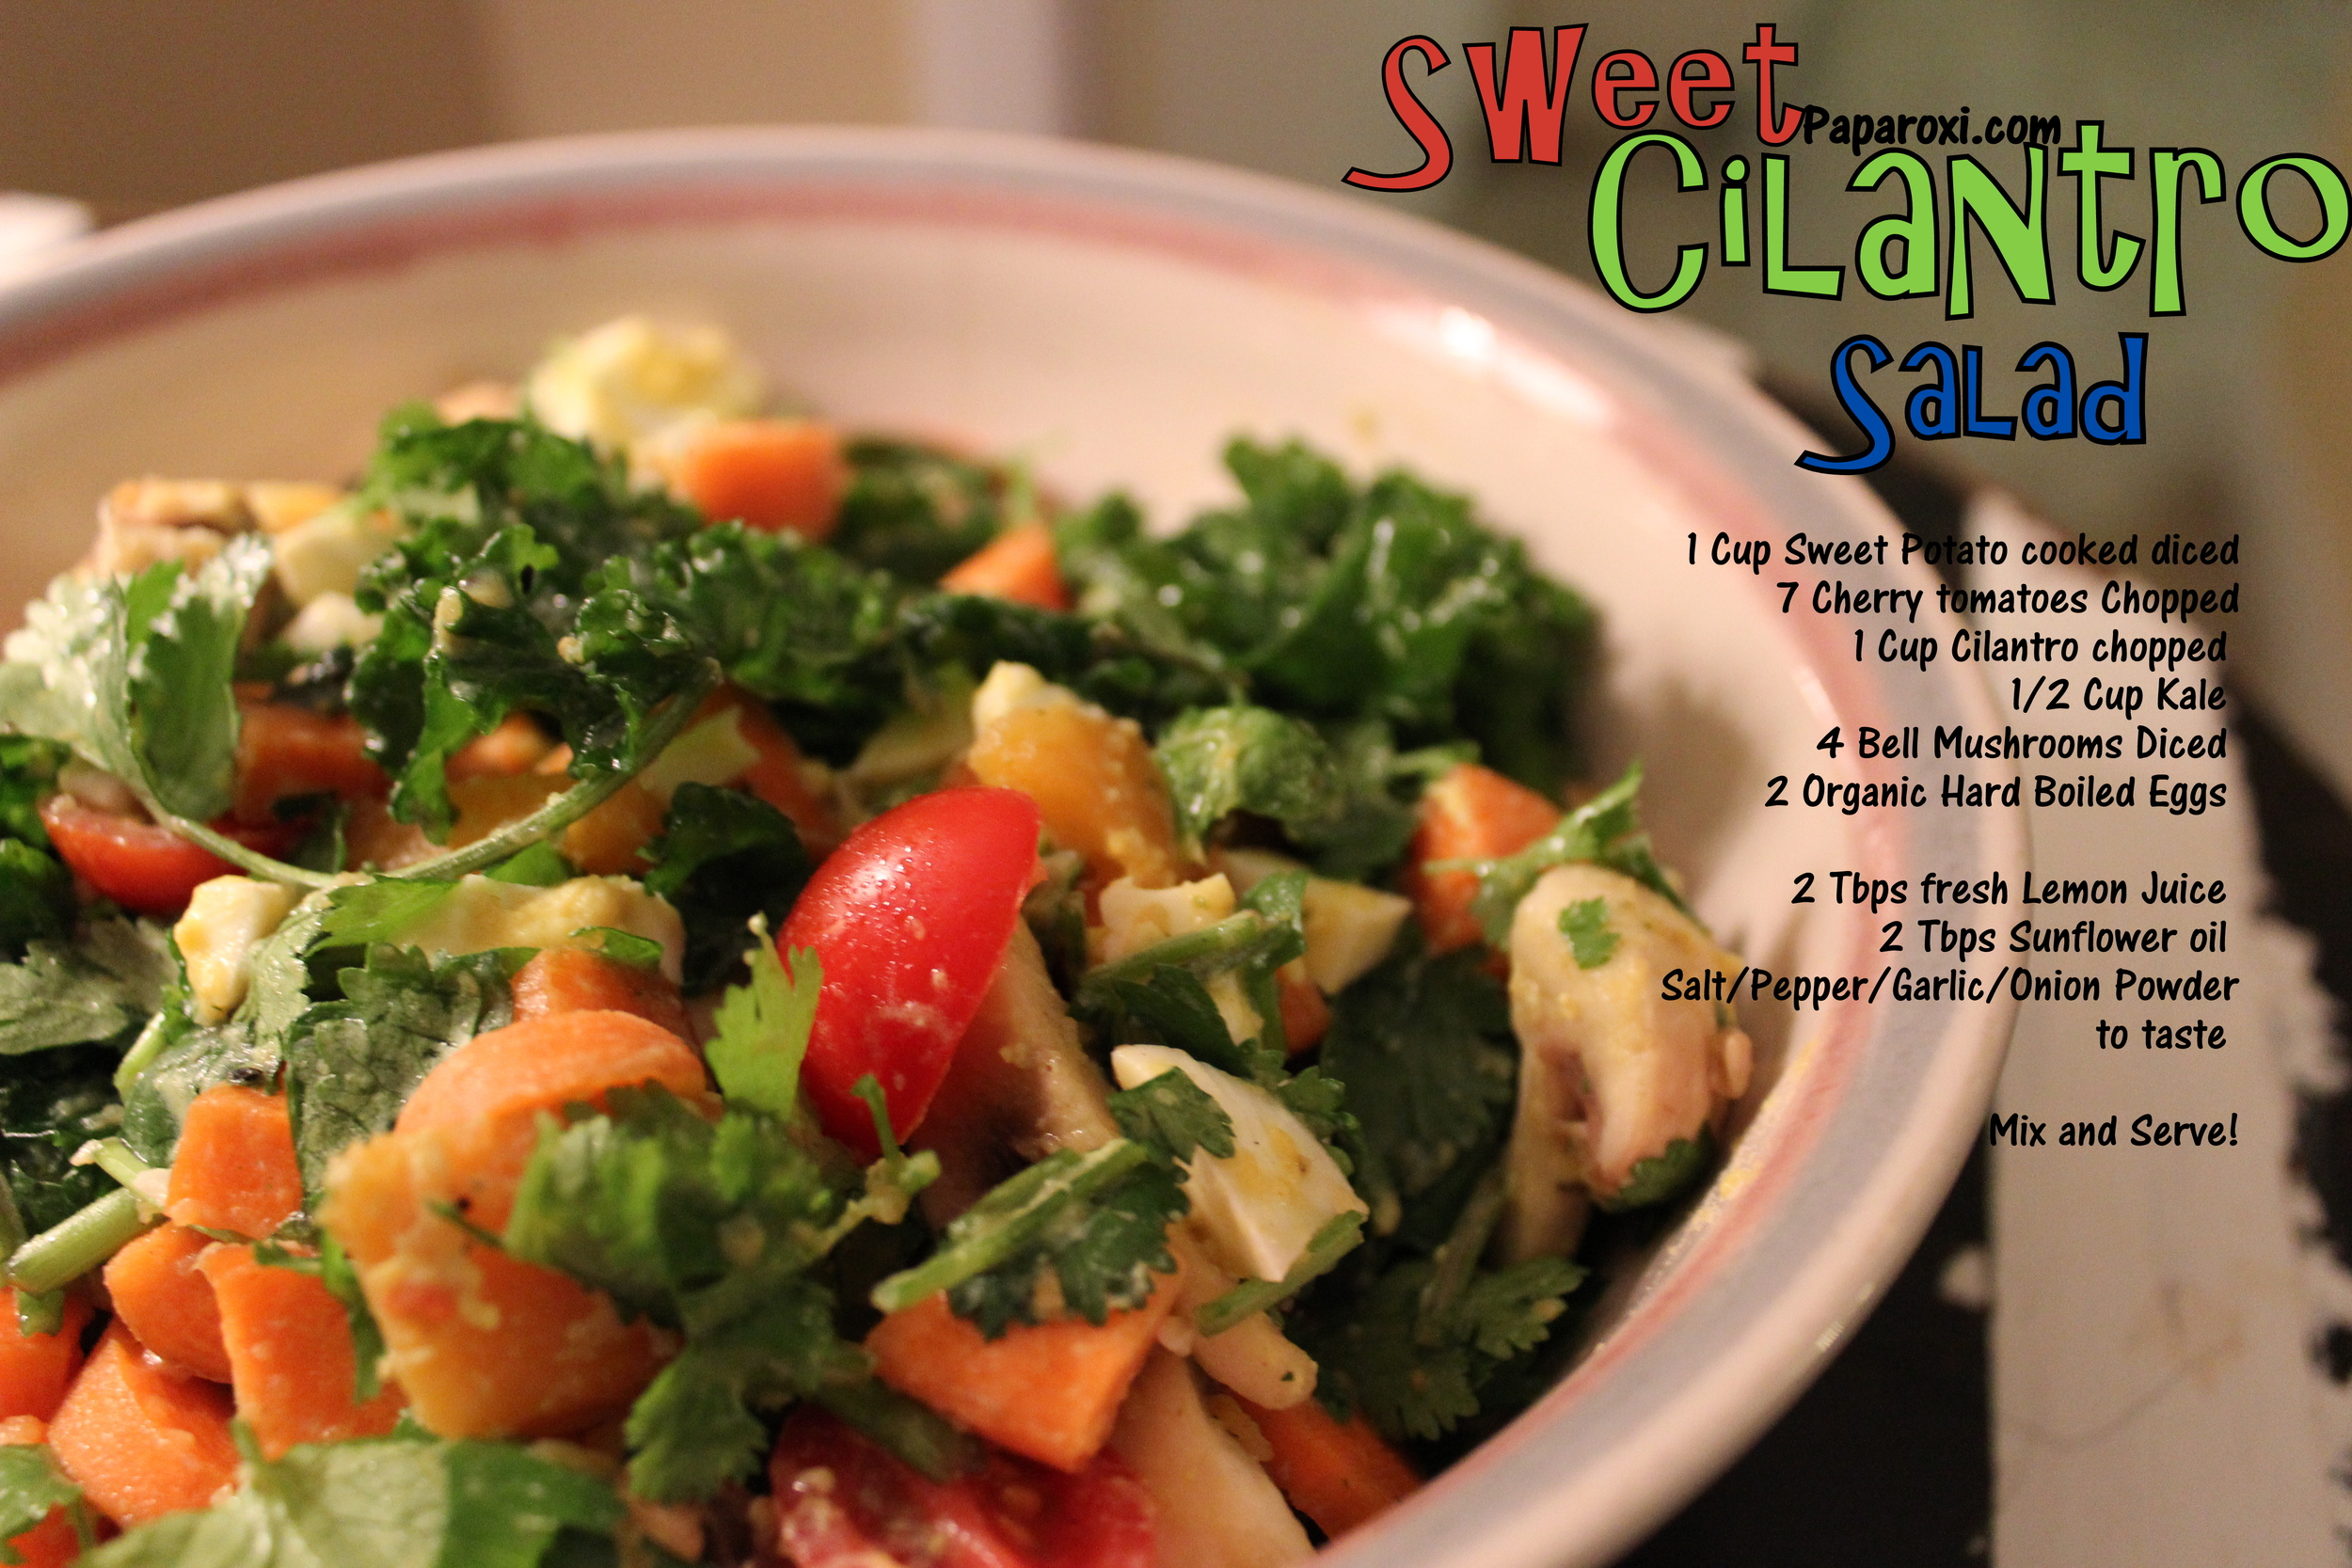 Sweet Cilantro Salad_recipe_healthy_healthyliving_paparoxi_food_vegetarian.jpg